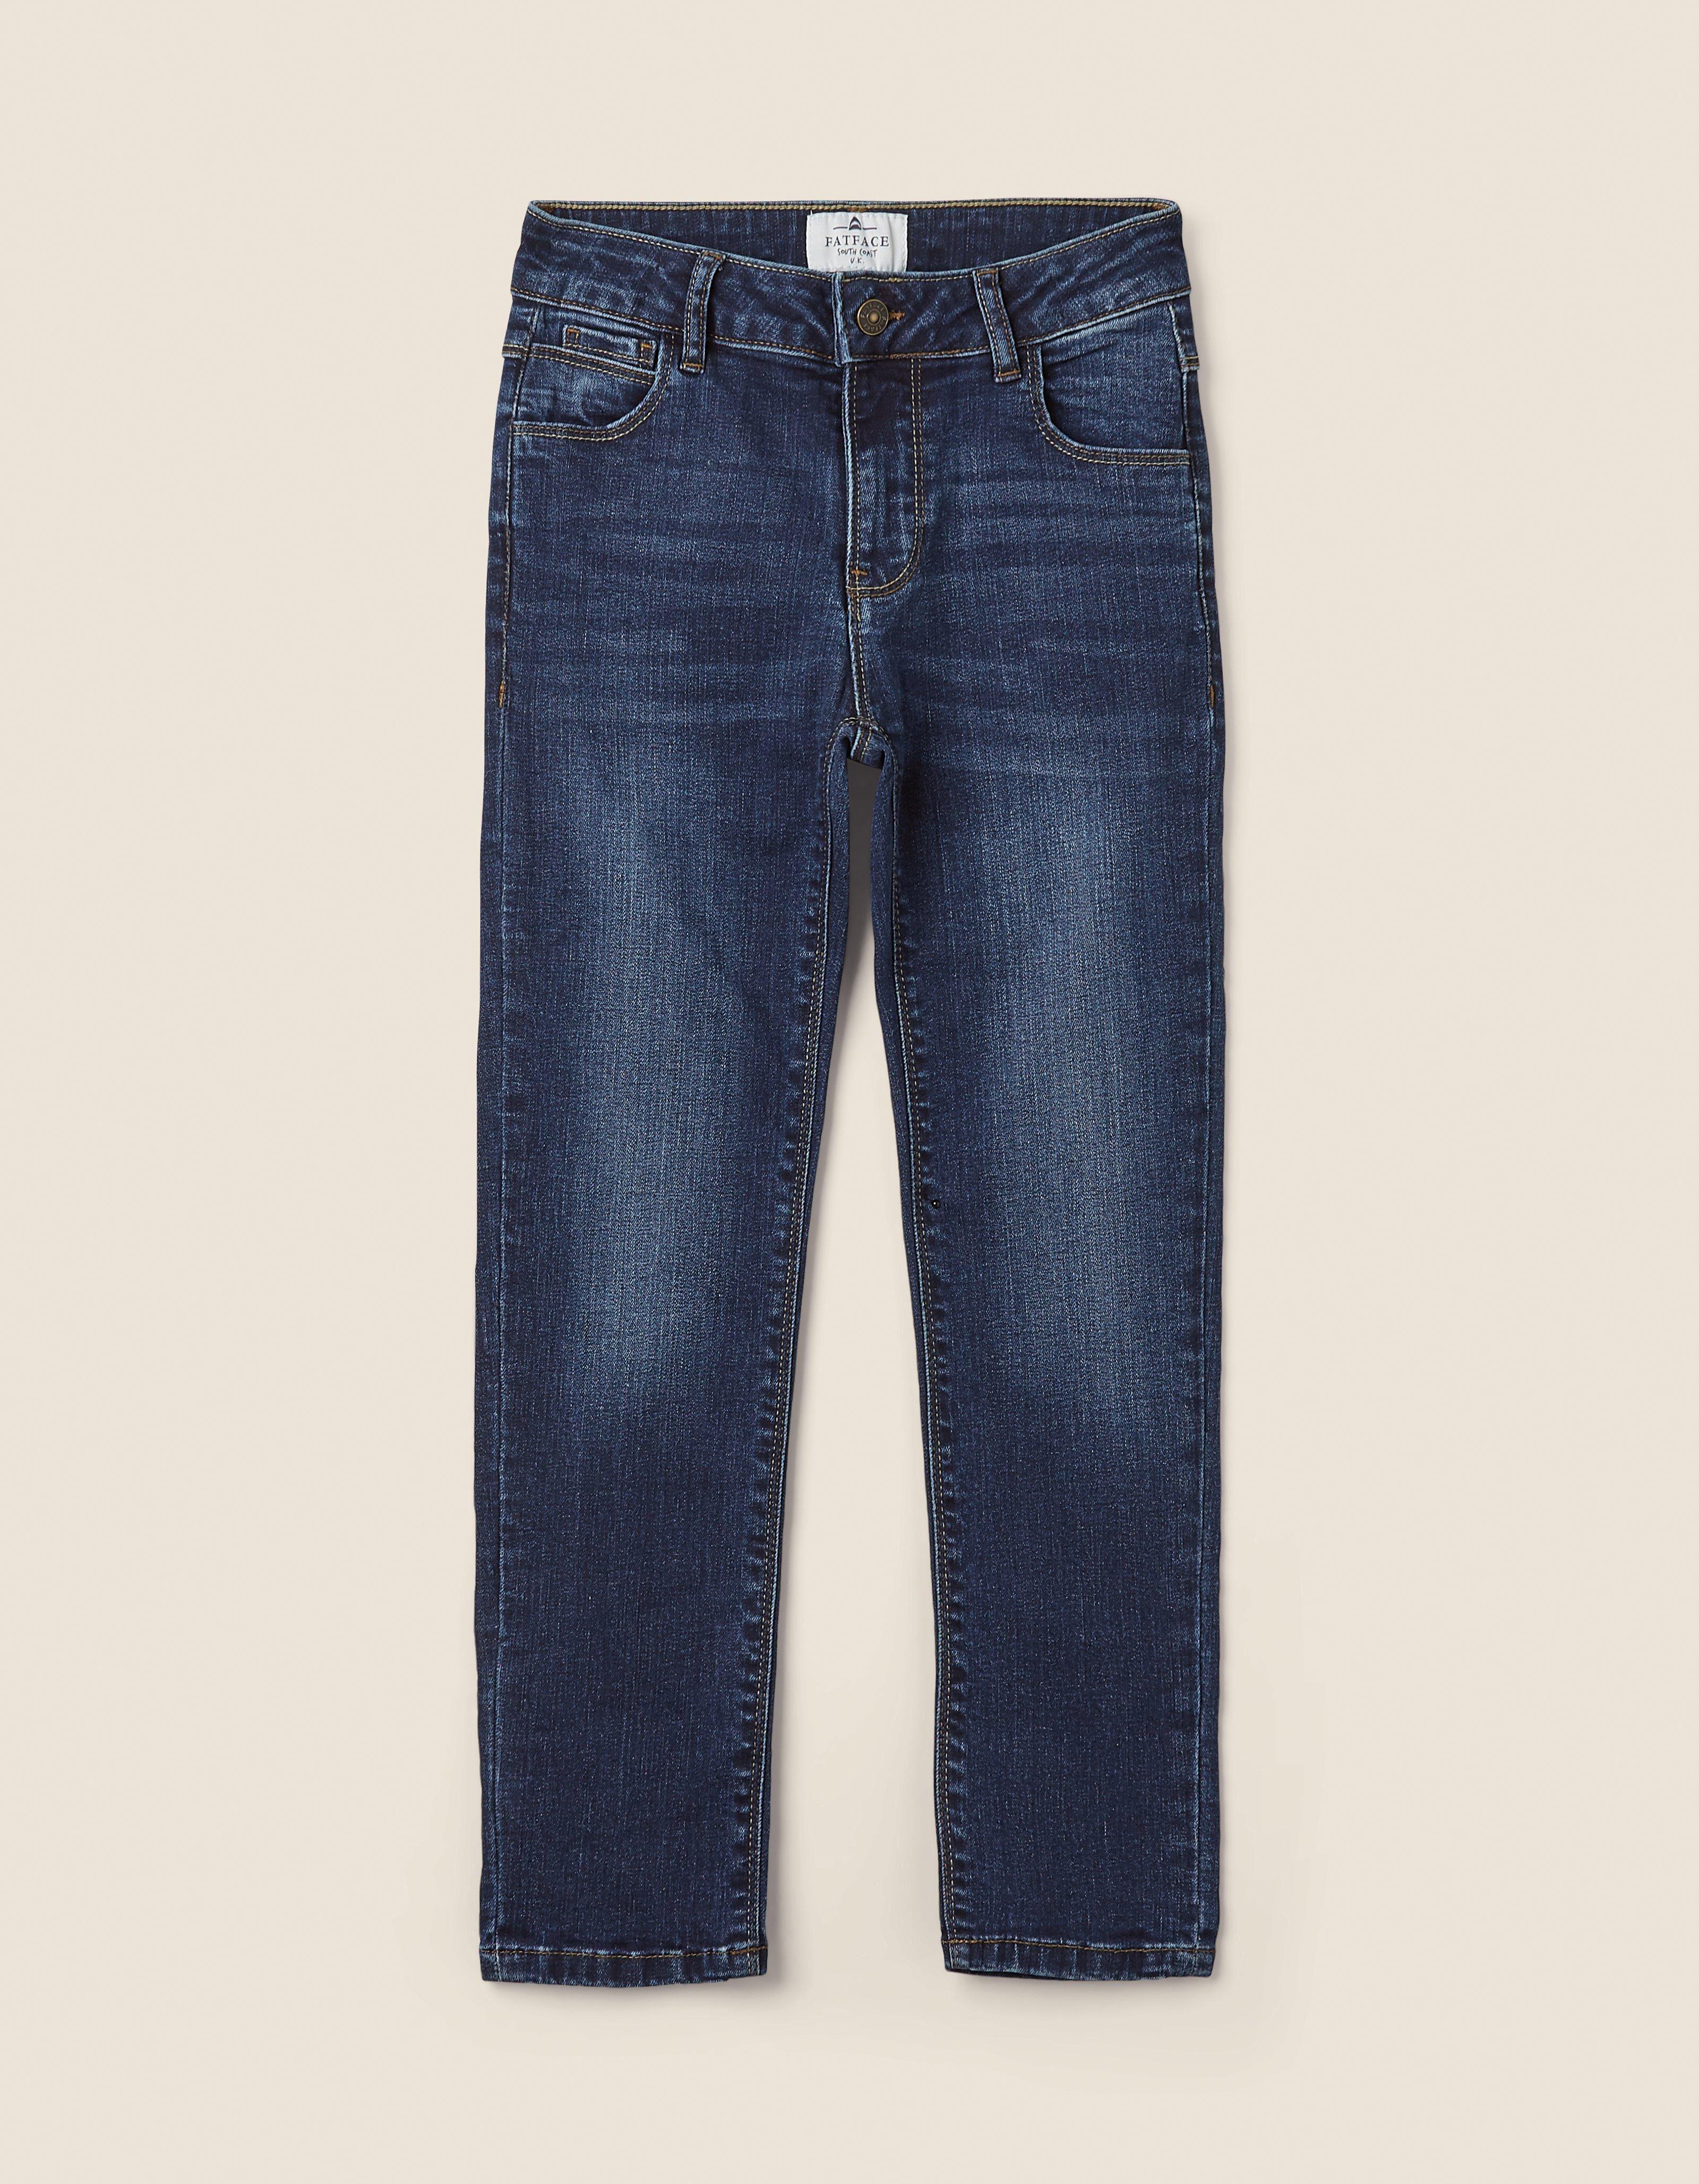 Fat Face Mid Blue Slim Jeans  - Size: 3